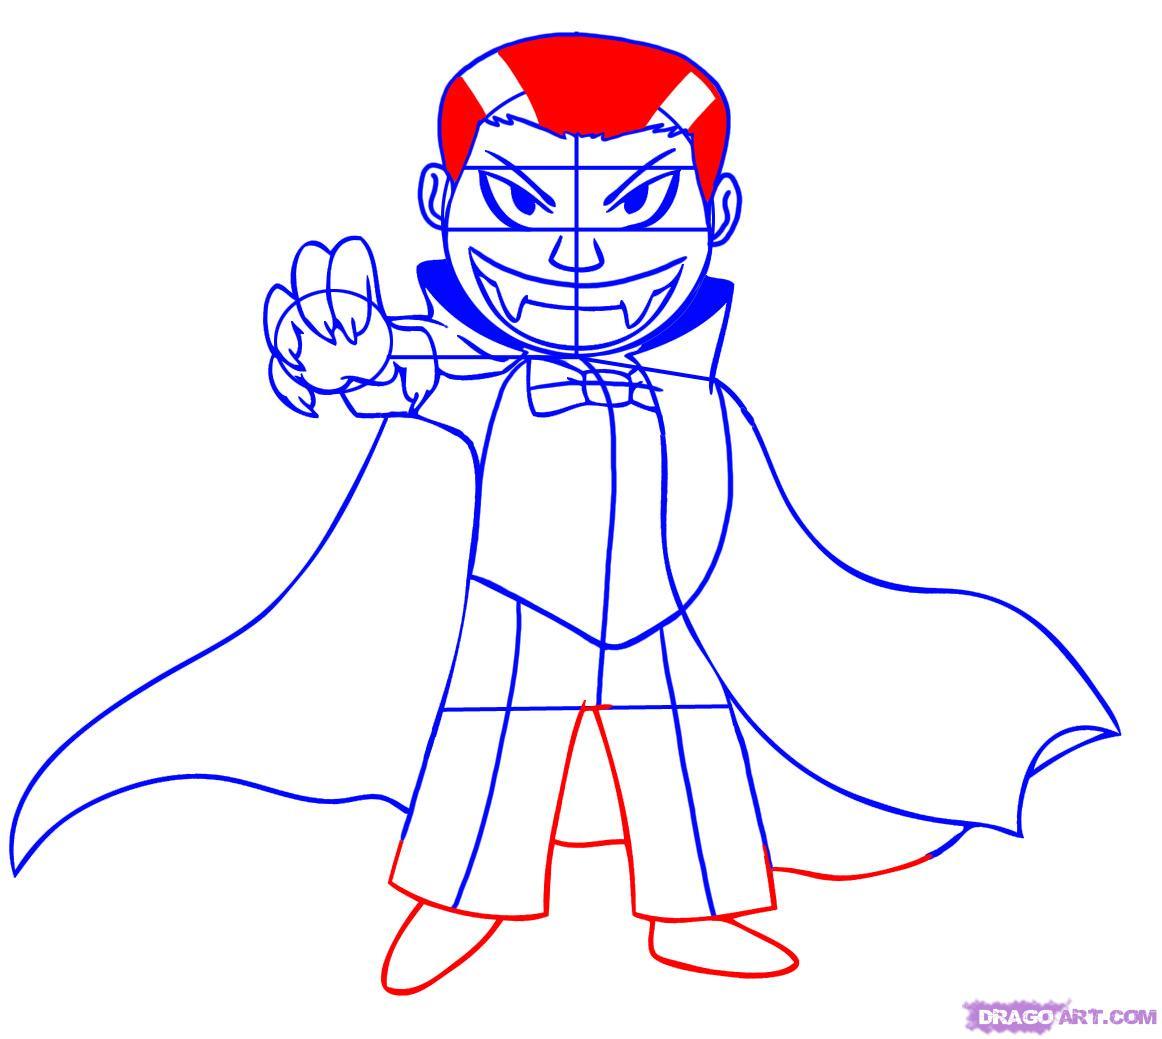 1162x1039 How To Draw A Cartoon Vampire, Step